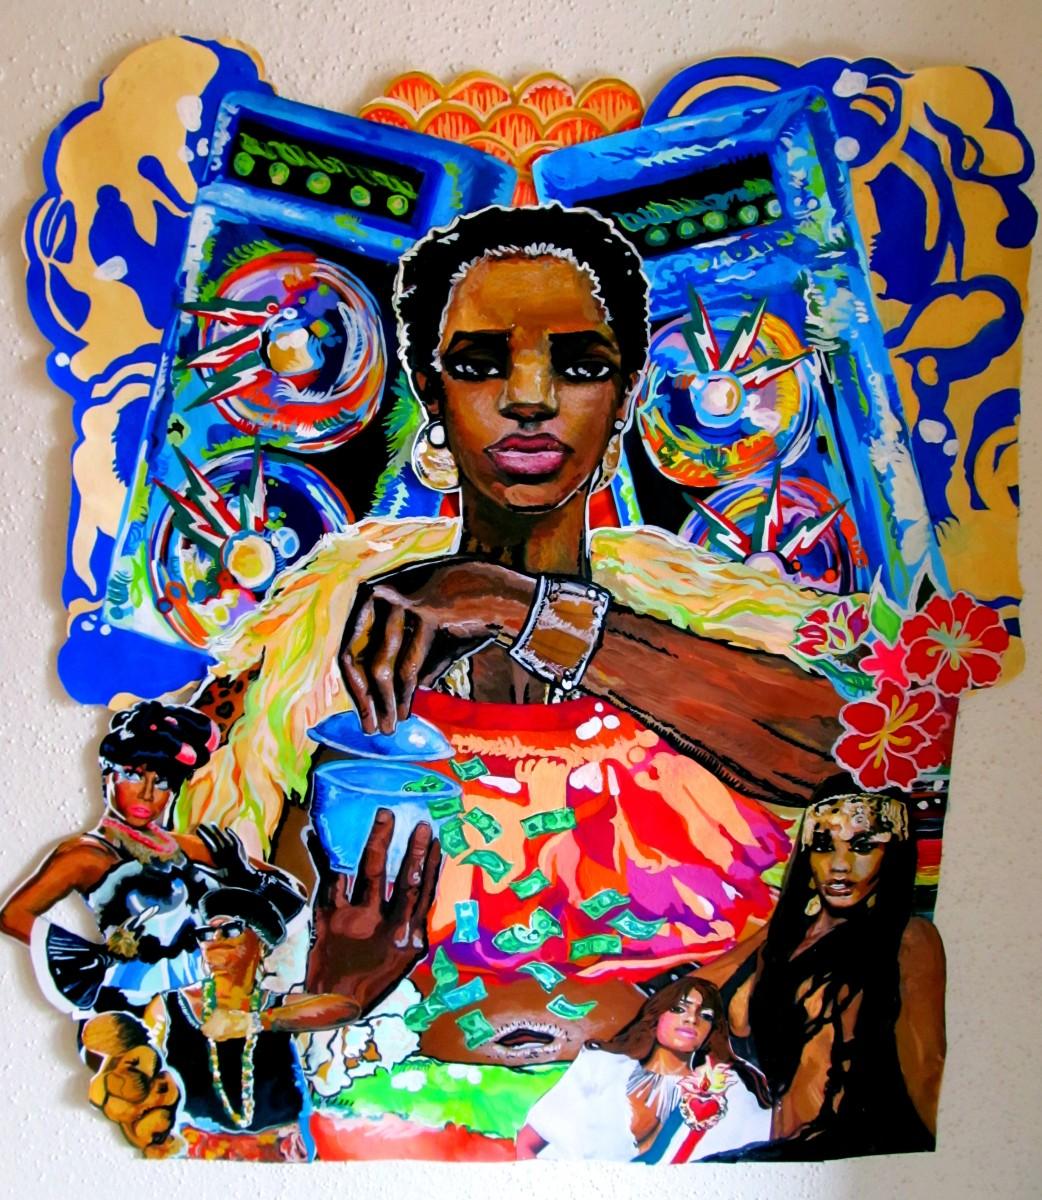 BlackBrown Feminism's HipHop